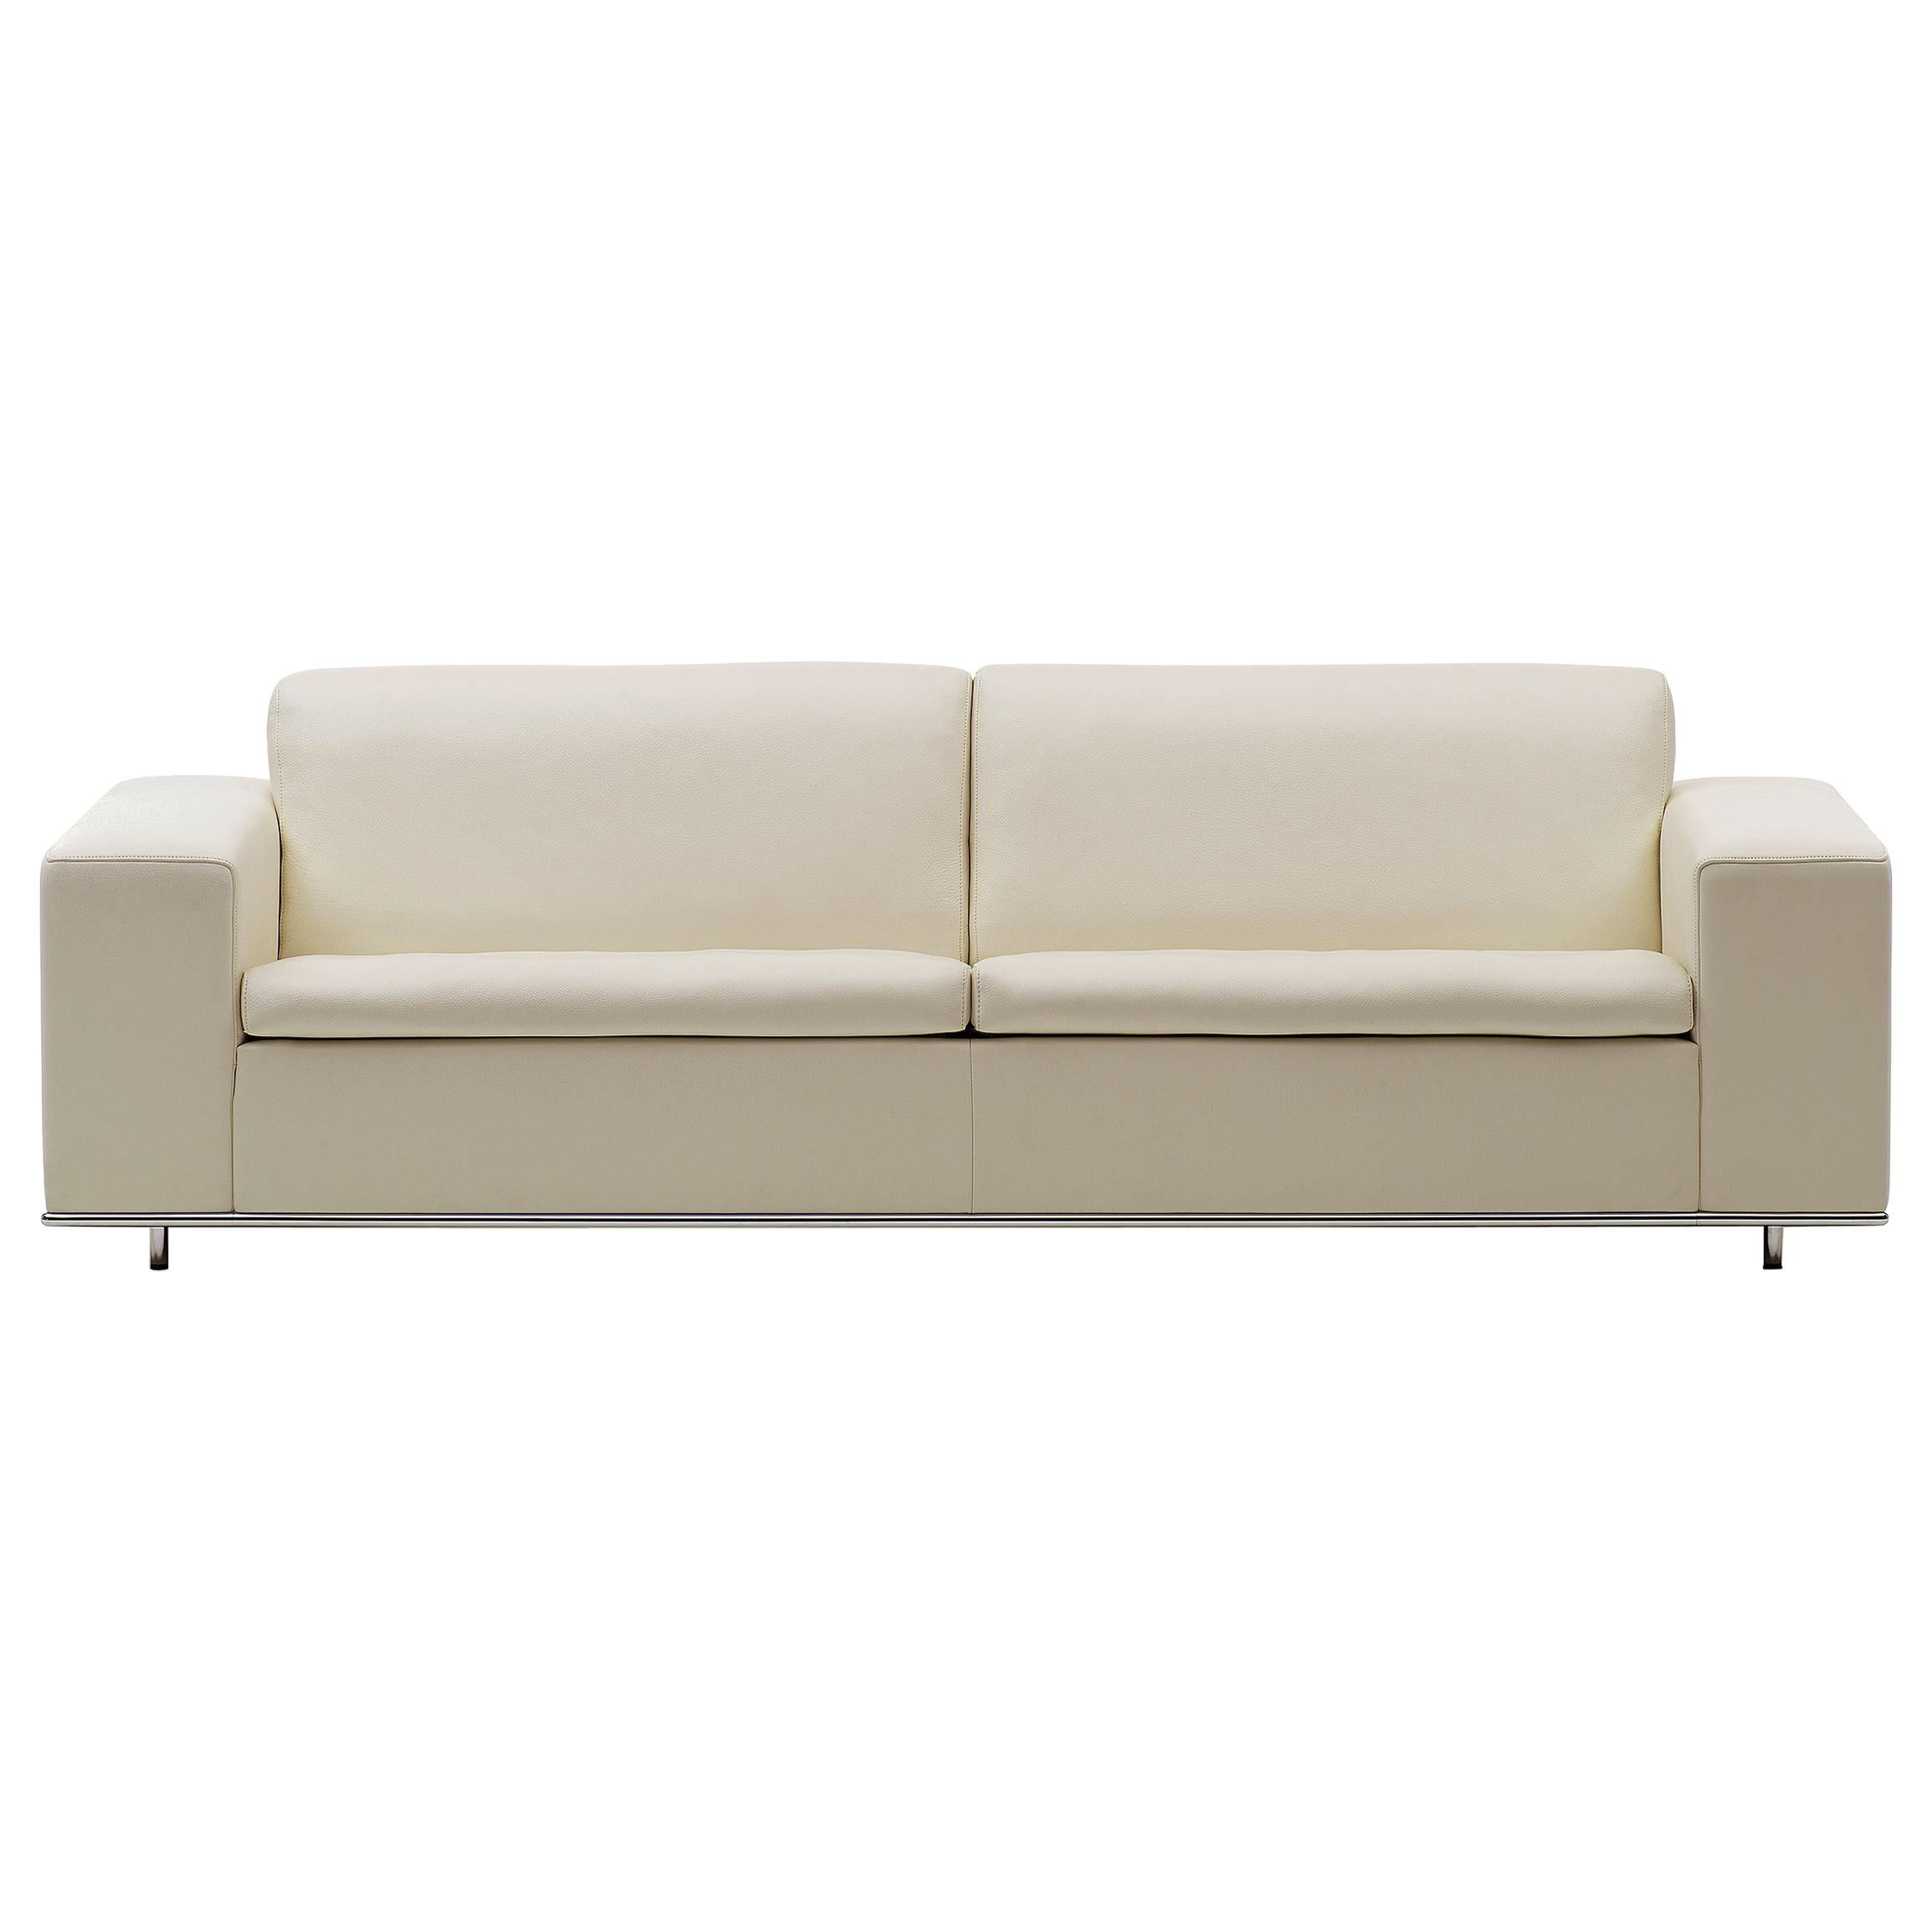 De Sede DS-3 Three-Seat Sofa in Beige Upholstery by Antonella Scarpitta